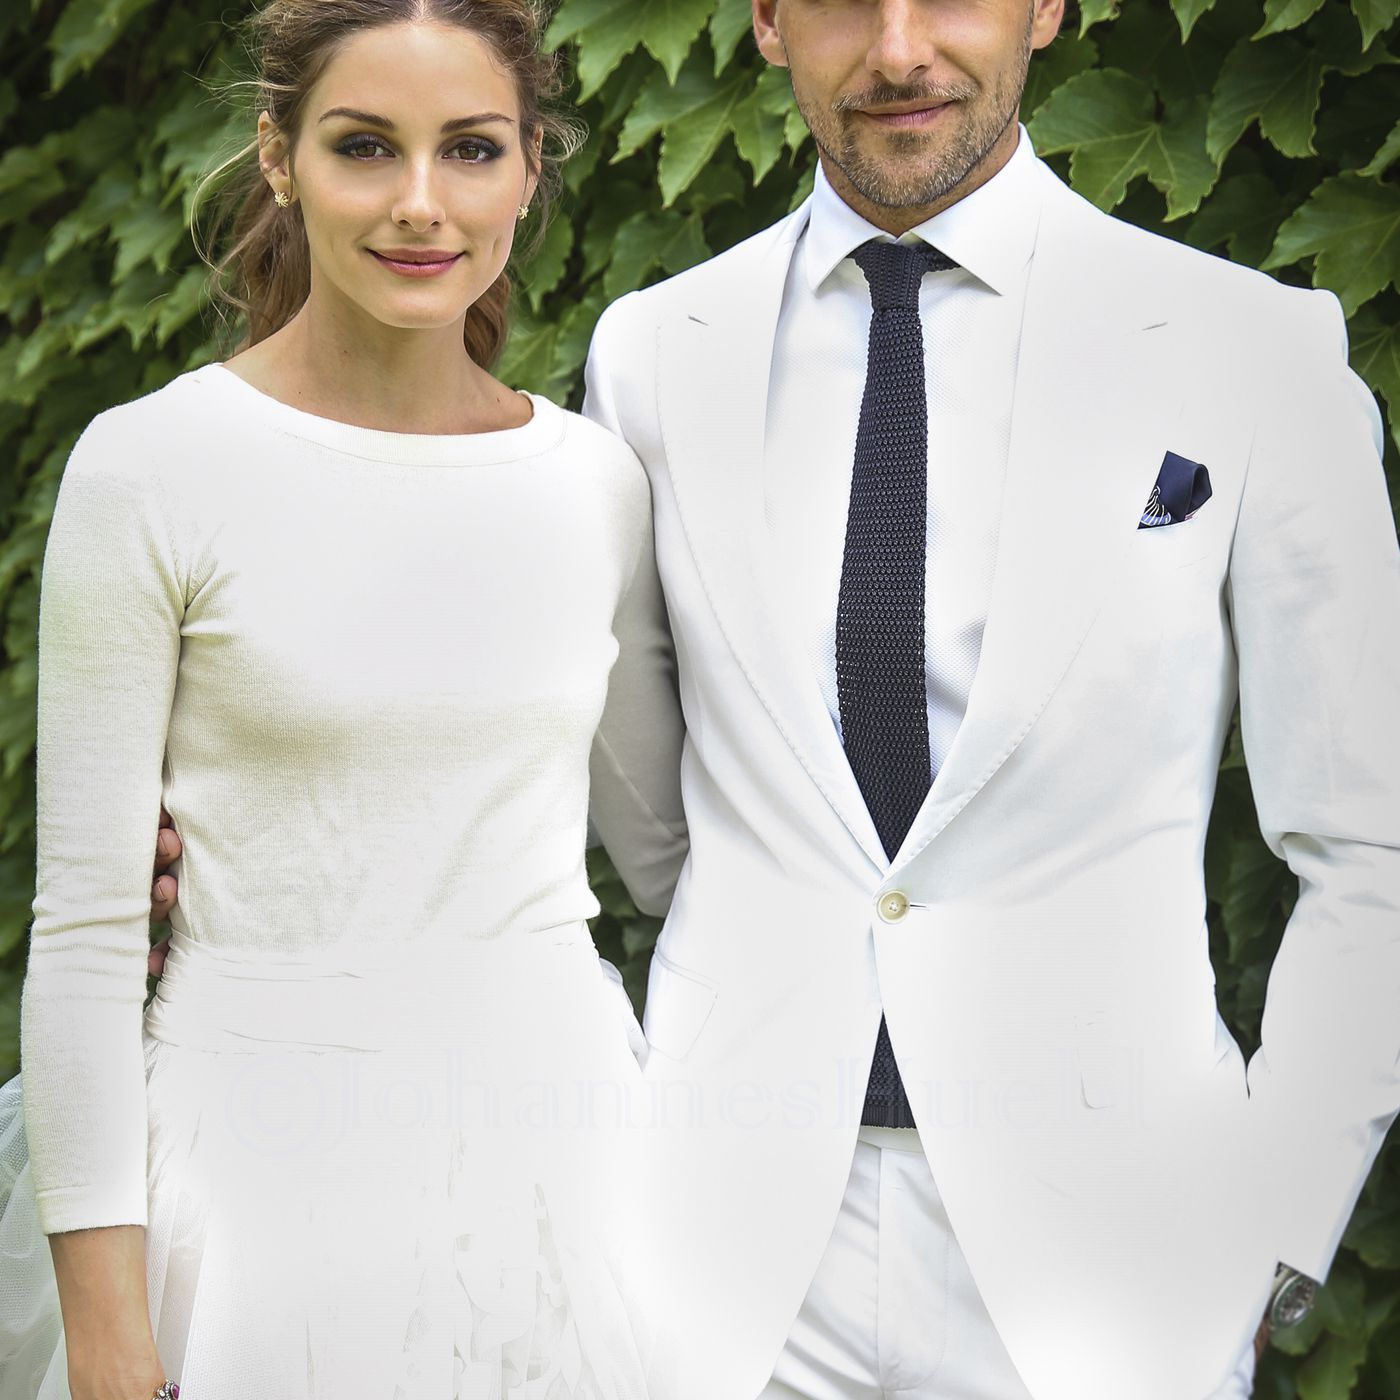 Olivia Palermo Wedding.Olivia Palermo Got Married In A Fancy Skort Racked